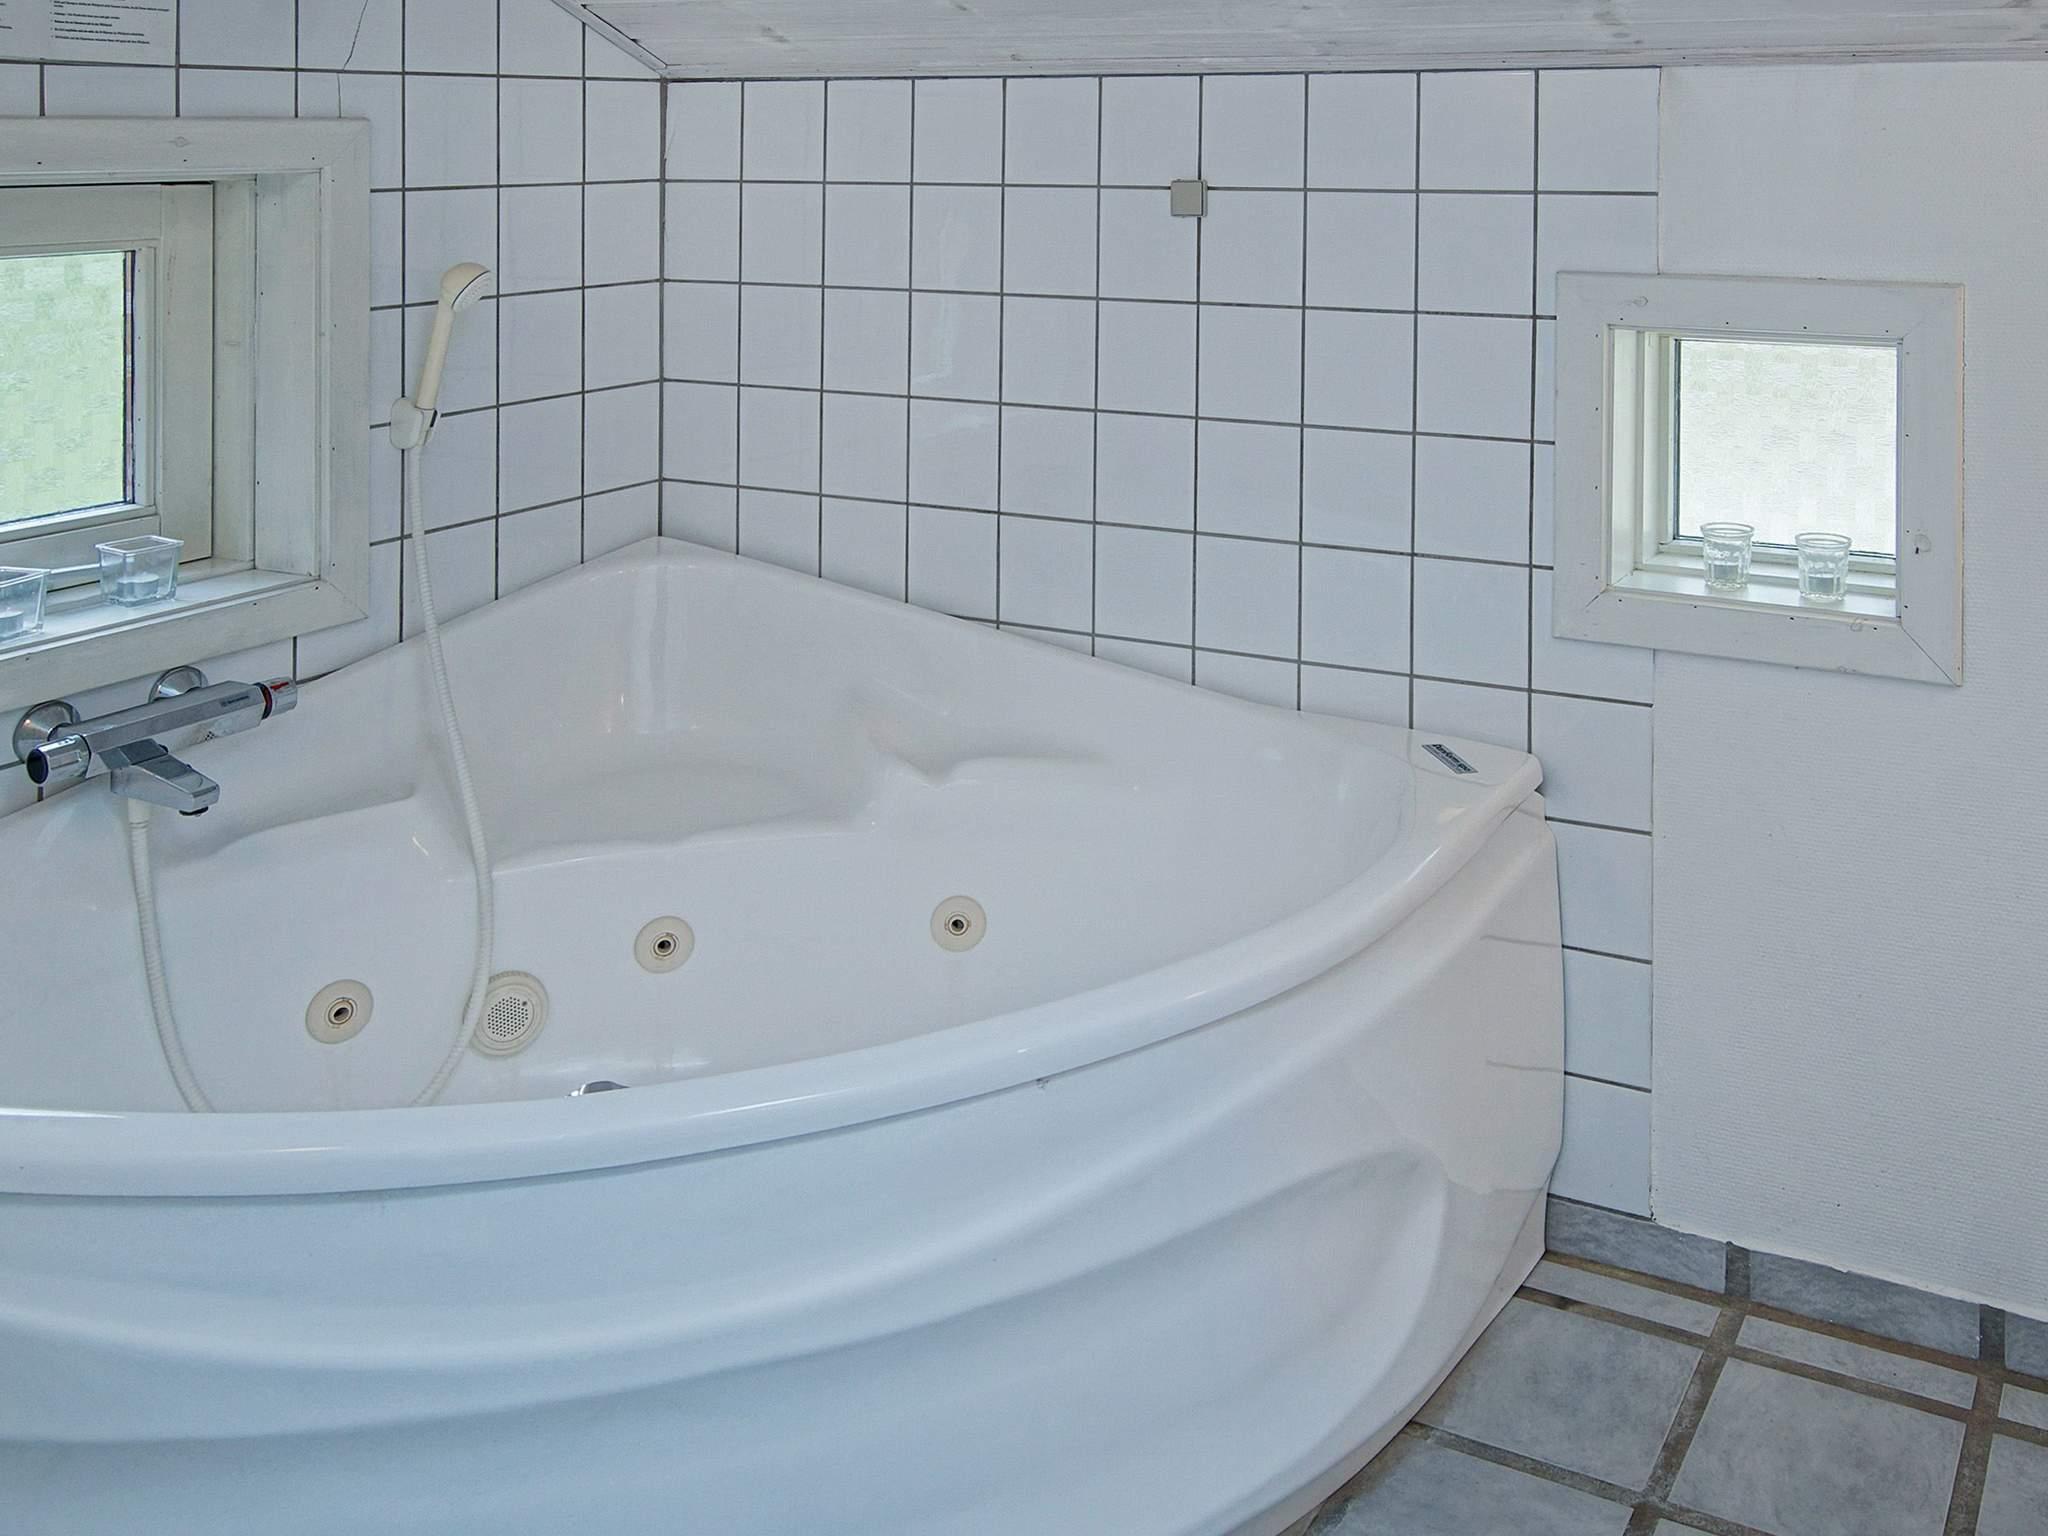 Ferienhaus Sommerodde (82550), Nexø, , Bornholm, Dänemark, Bild 14